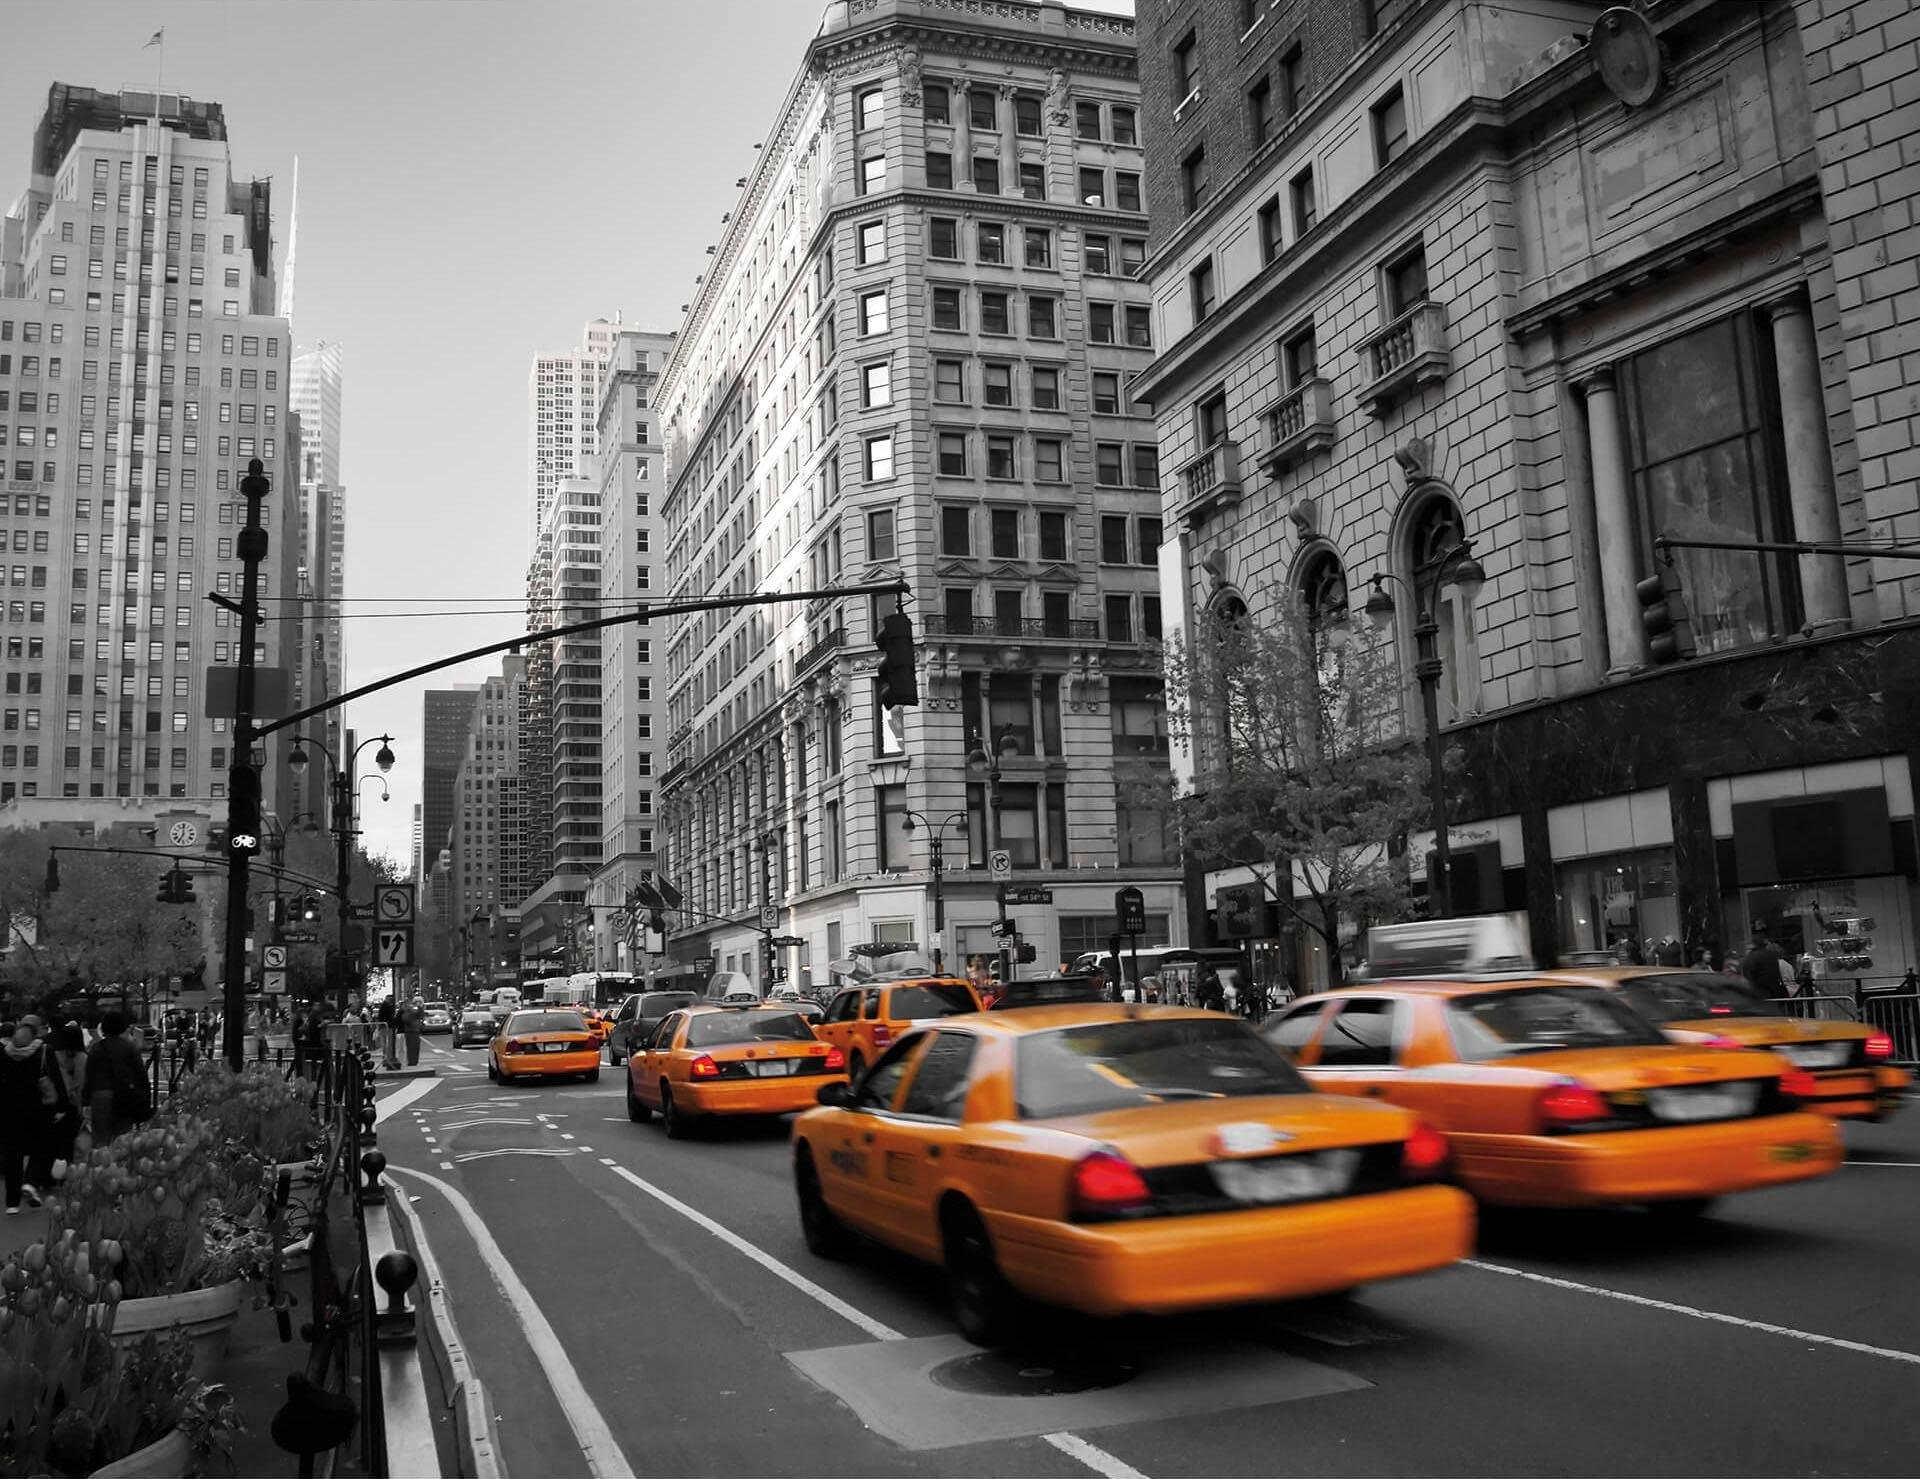 Wall-Art vliesbehang Cabs in Manhattan nu online bestellen